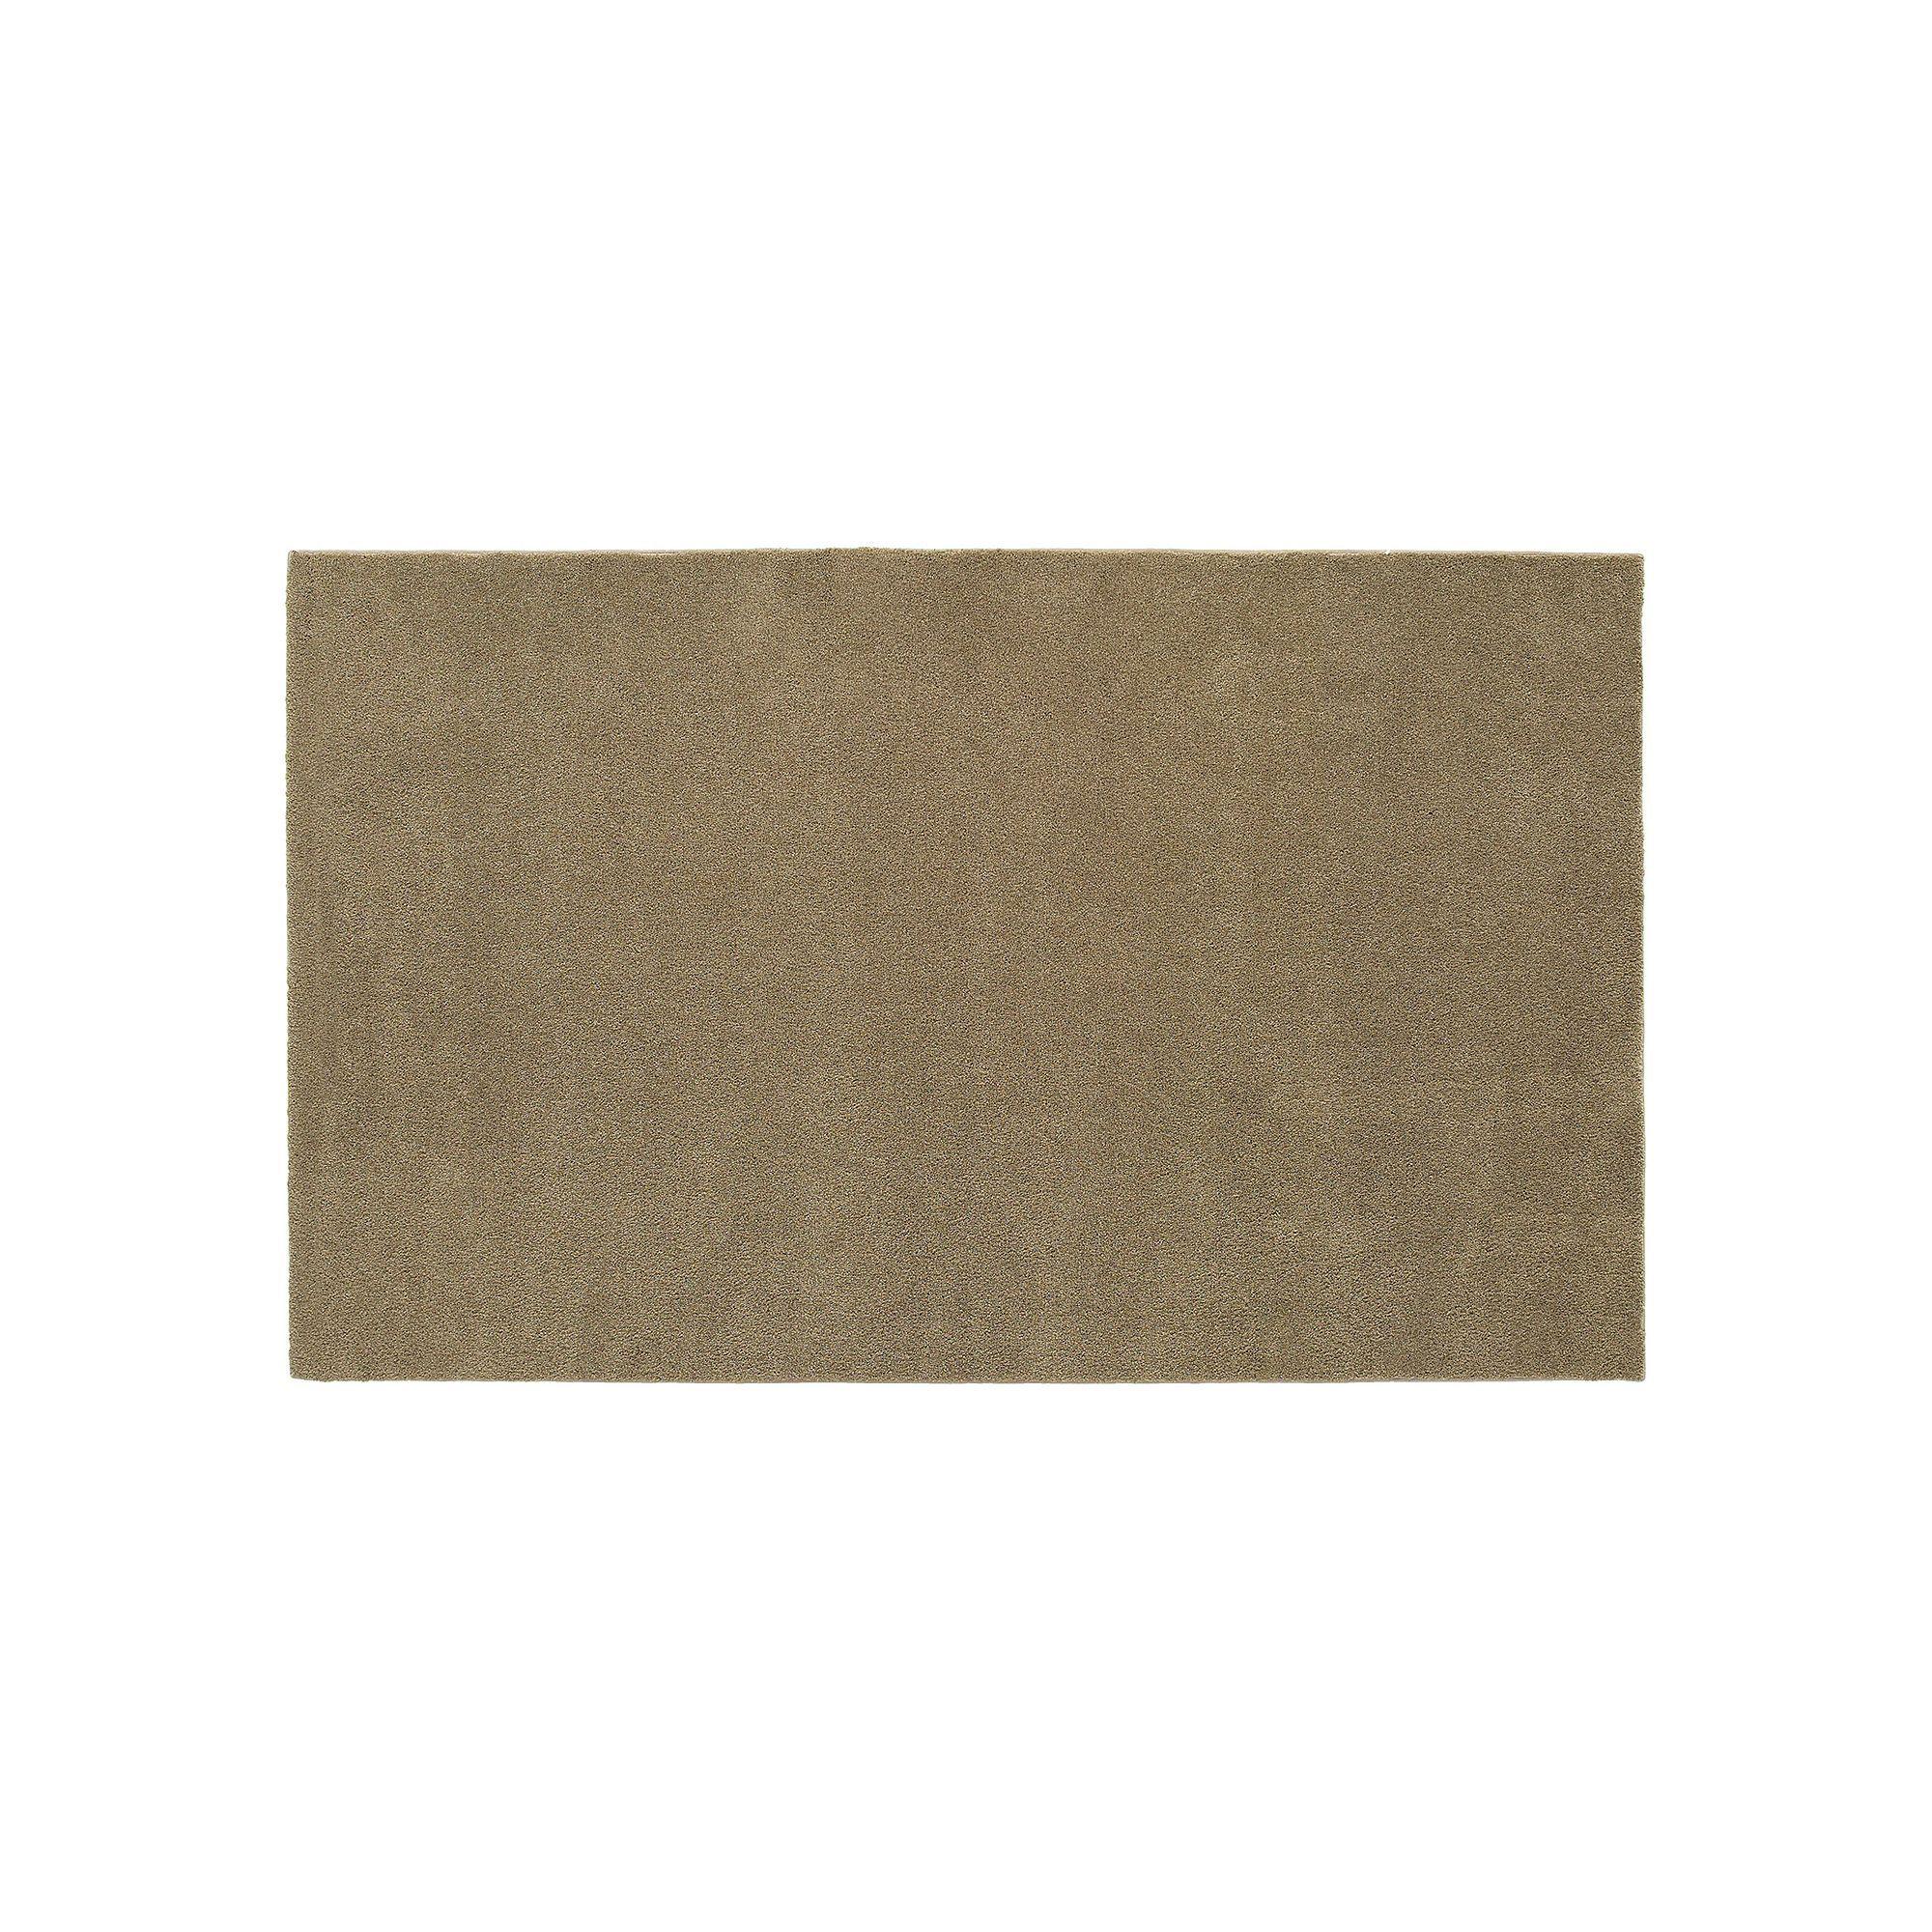 Groovy Garland Rug Bathroom Carpet 5 X 8 Products Bathroom Download Free Architecture Designs Embacsunscenecom